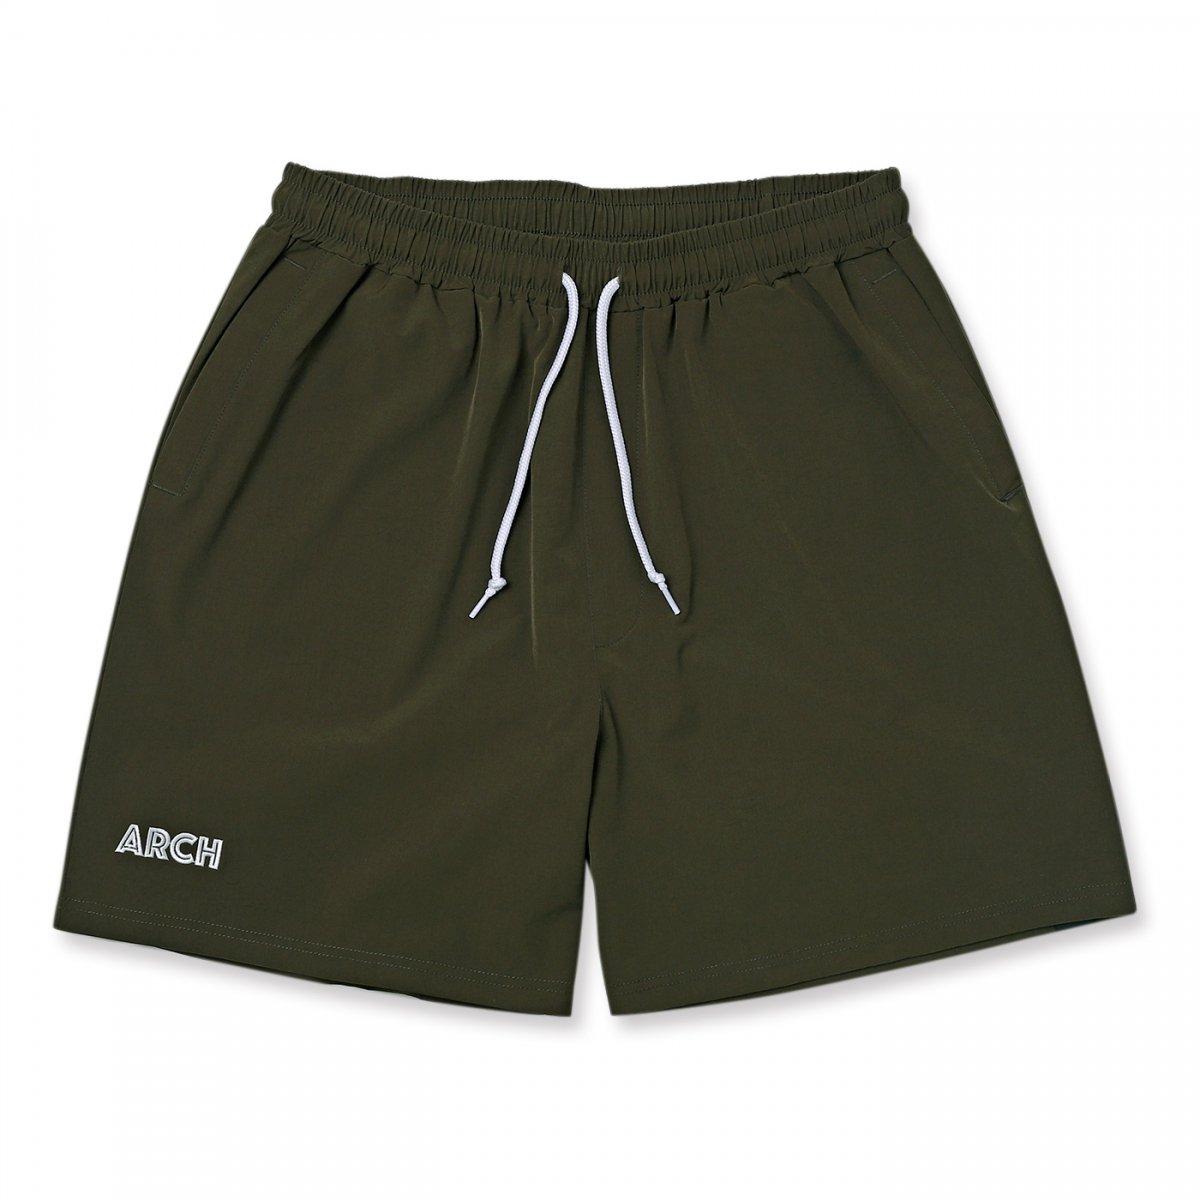 stretch nylon short pants 【khaki】